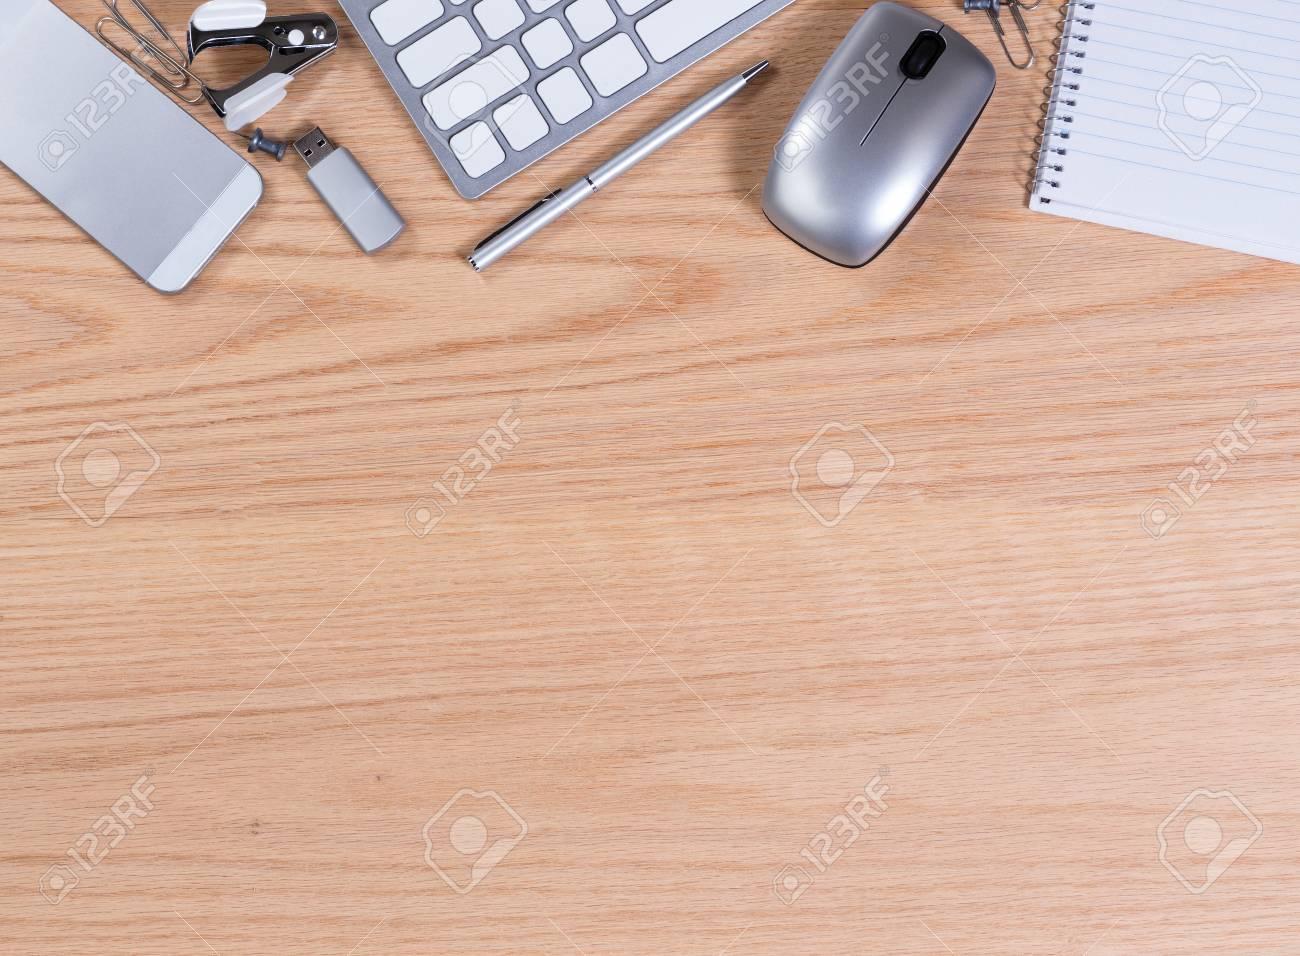 Office Desktop Mit Computer Tastatur Maus Usb Stick Stift Papier